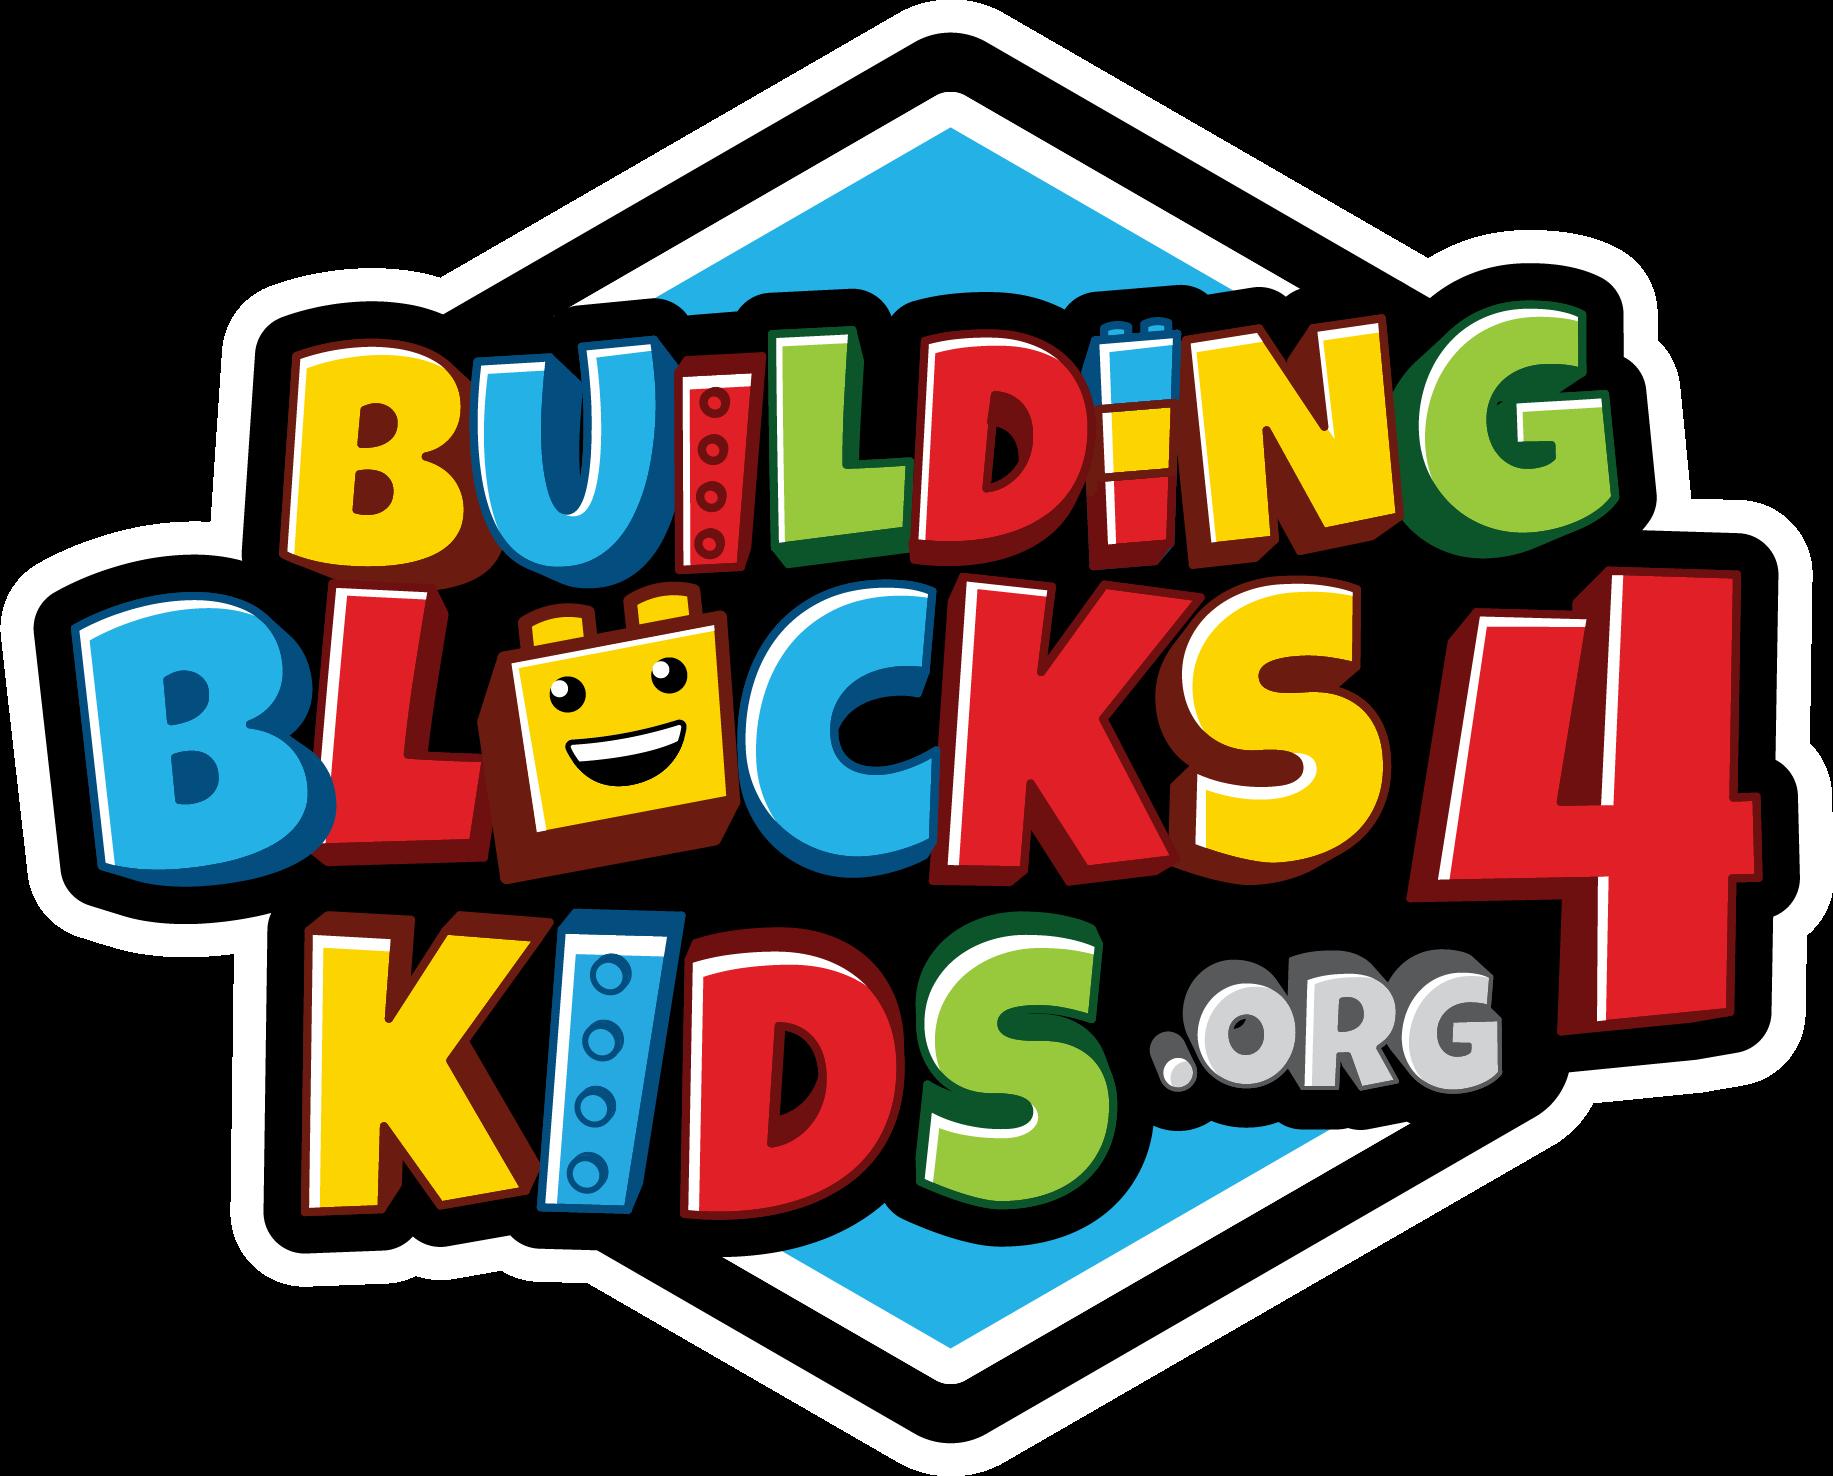 Building Blocks 4 Kids